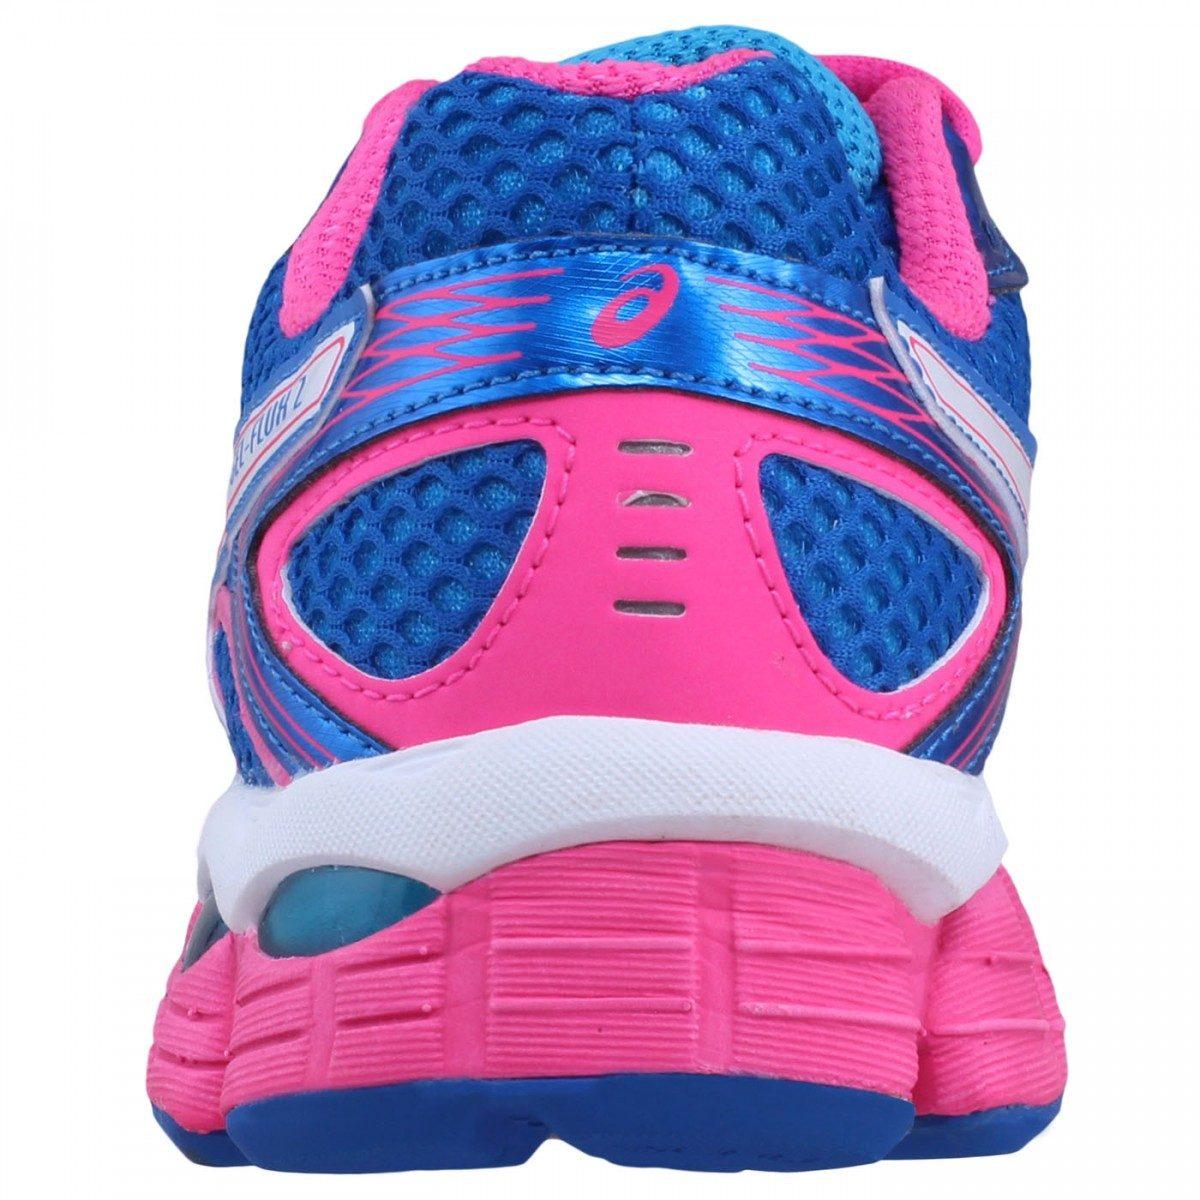 tenis asics feminino rosa colorido